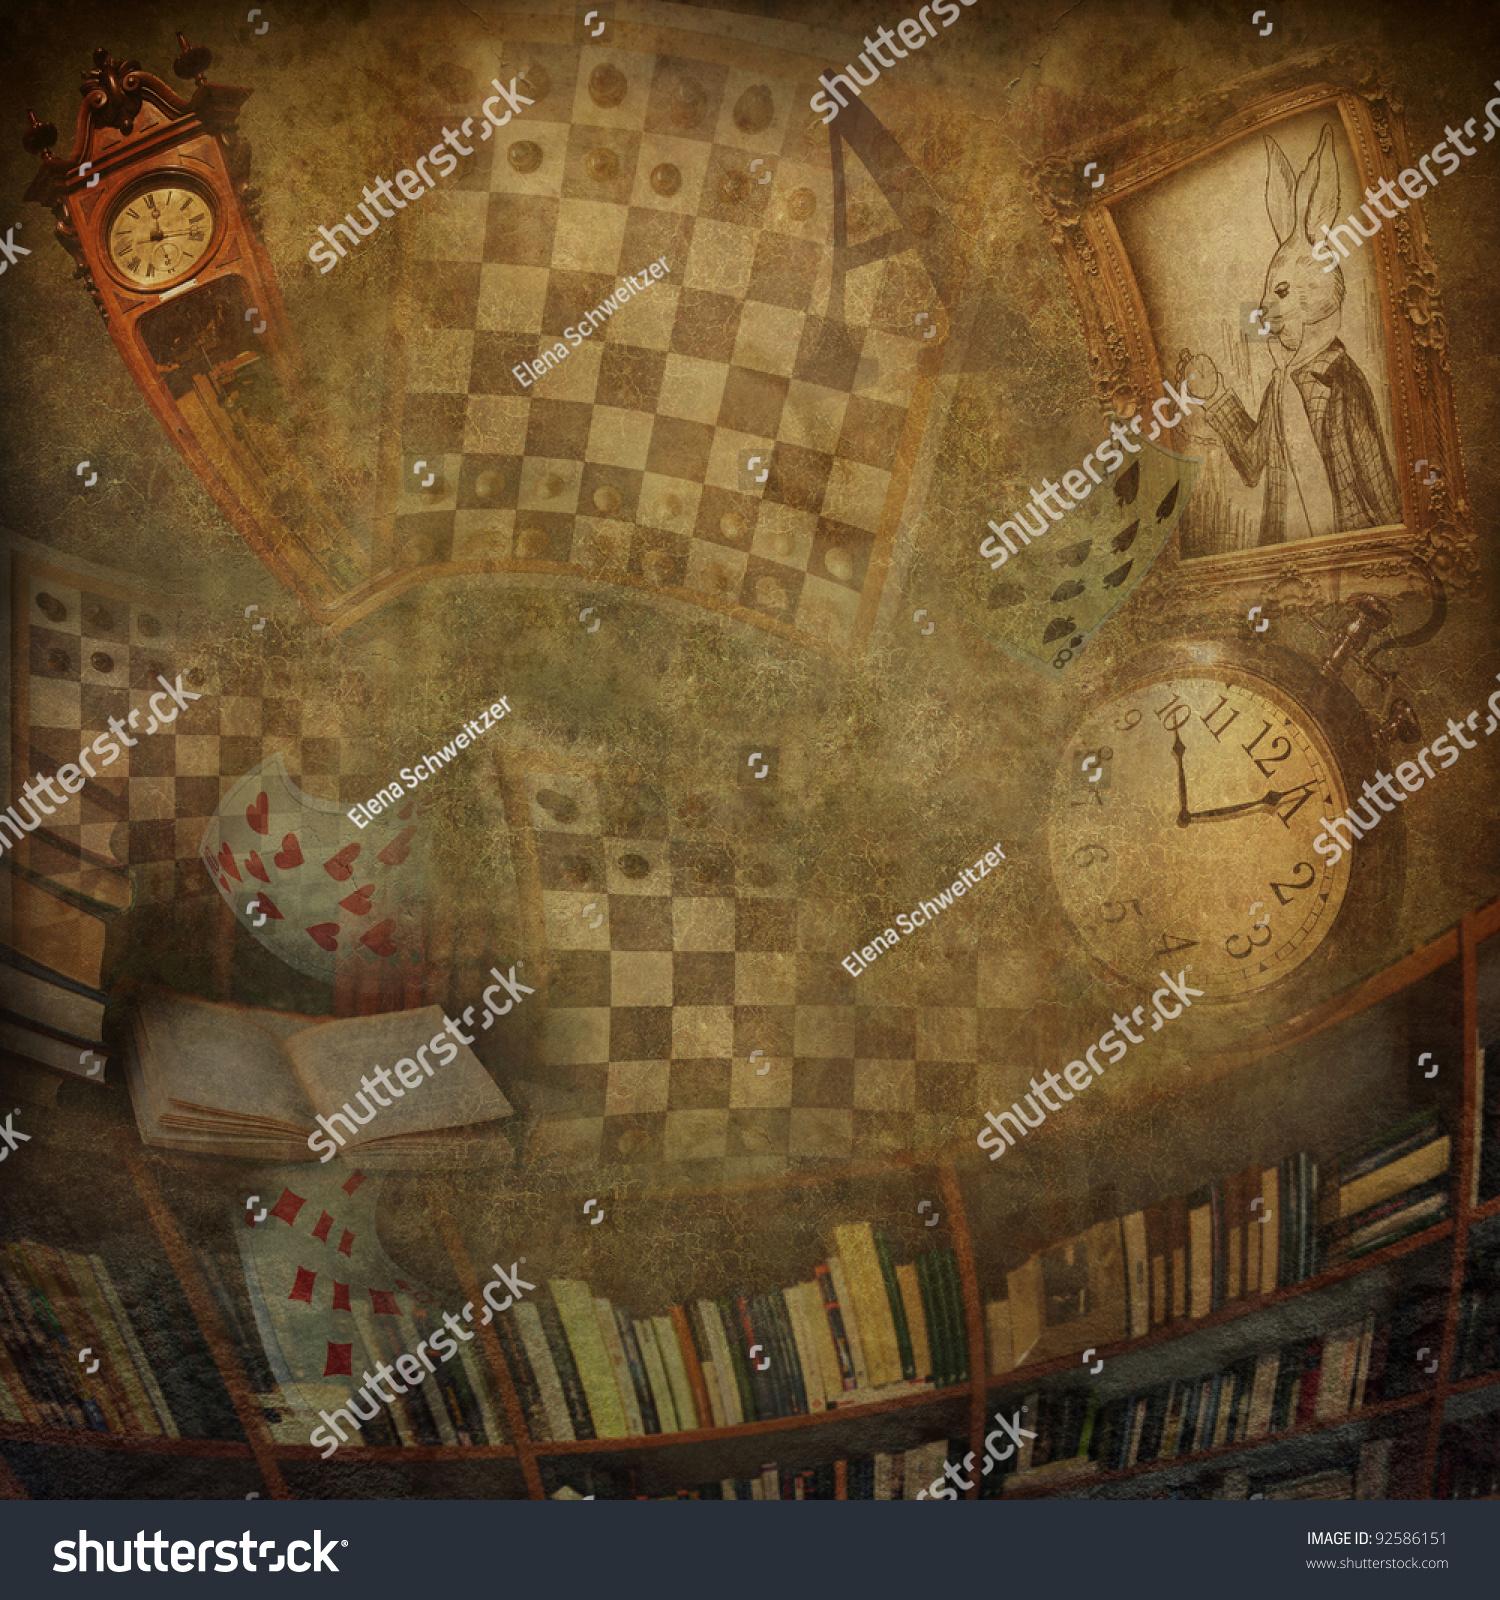 Falling Down The Rabbit Hole Wallpaper Abstract Background Novel Alice Wonderland Stock Photo